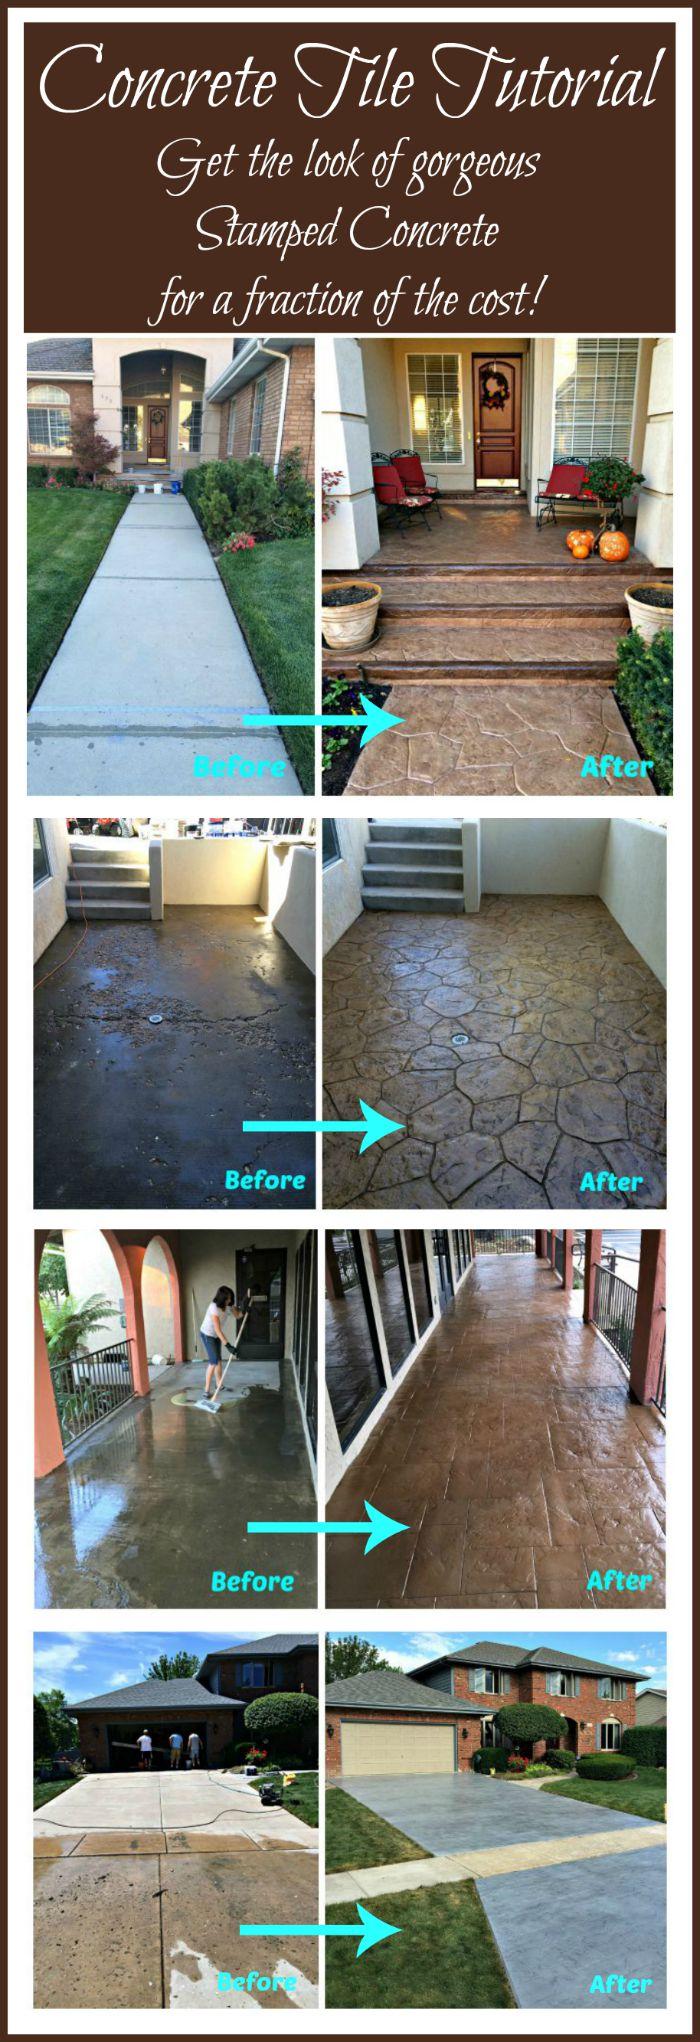 Diy Stamped Concrete Tile Tutorial Do It Yourself Fun Ideas